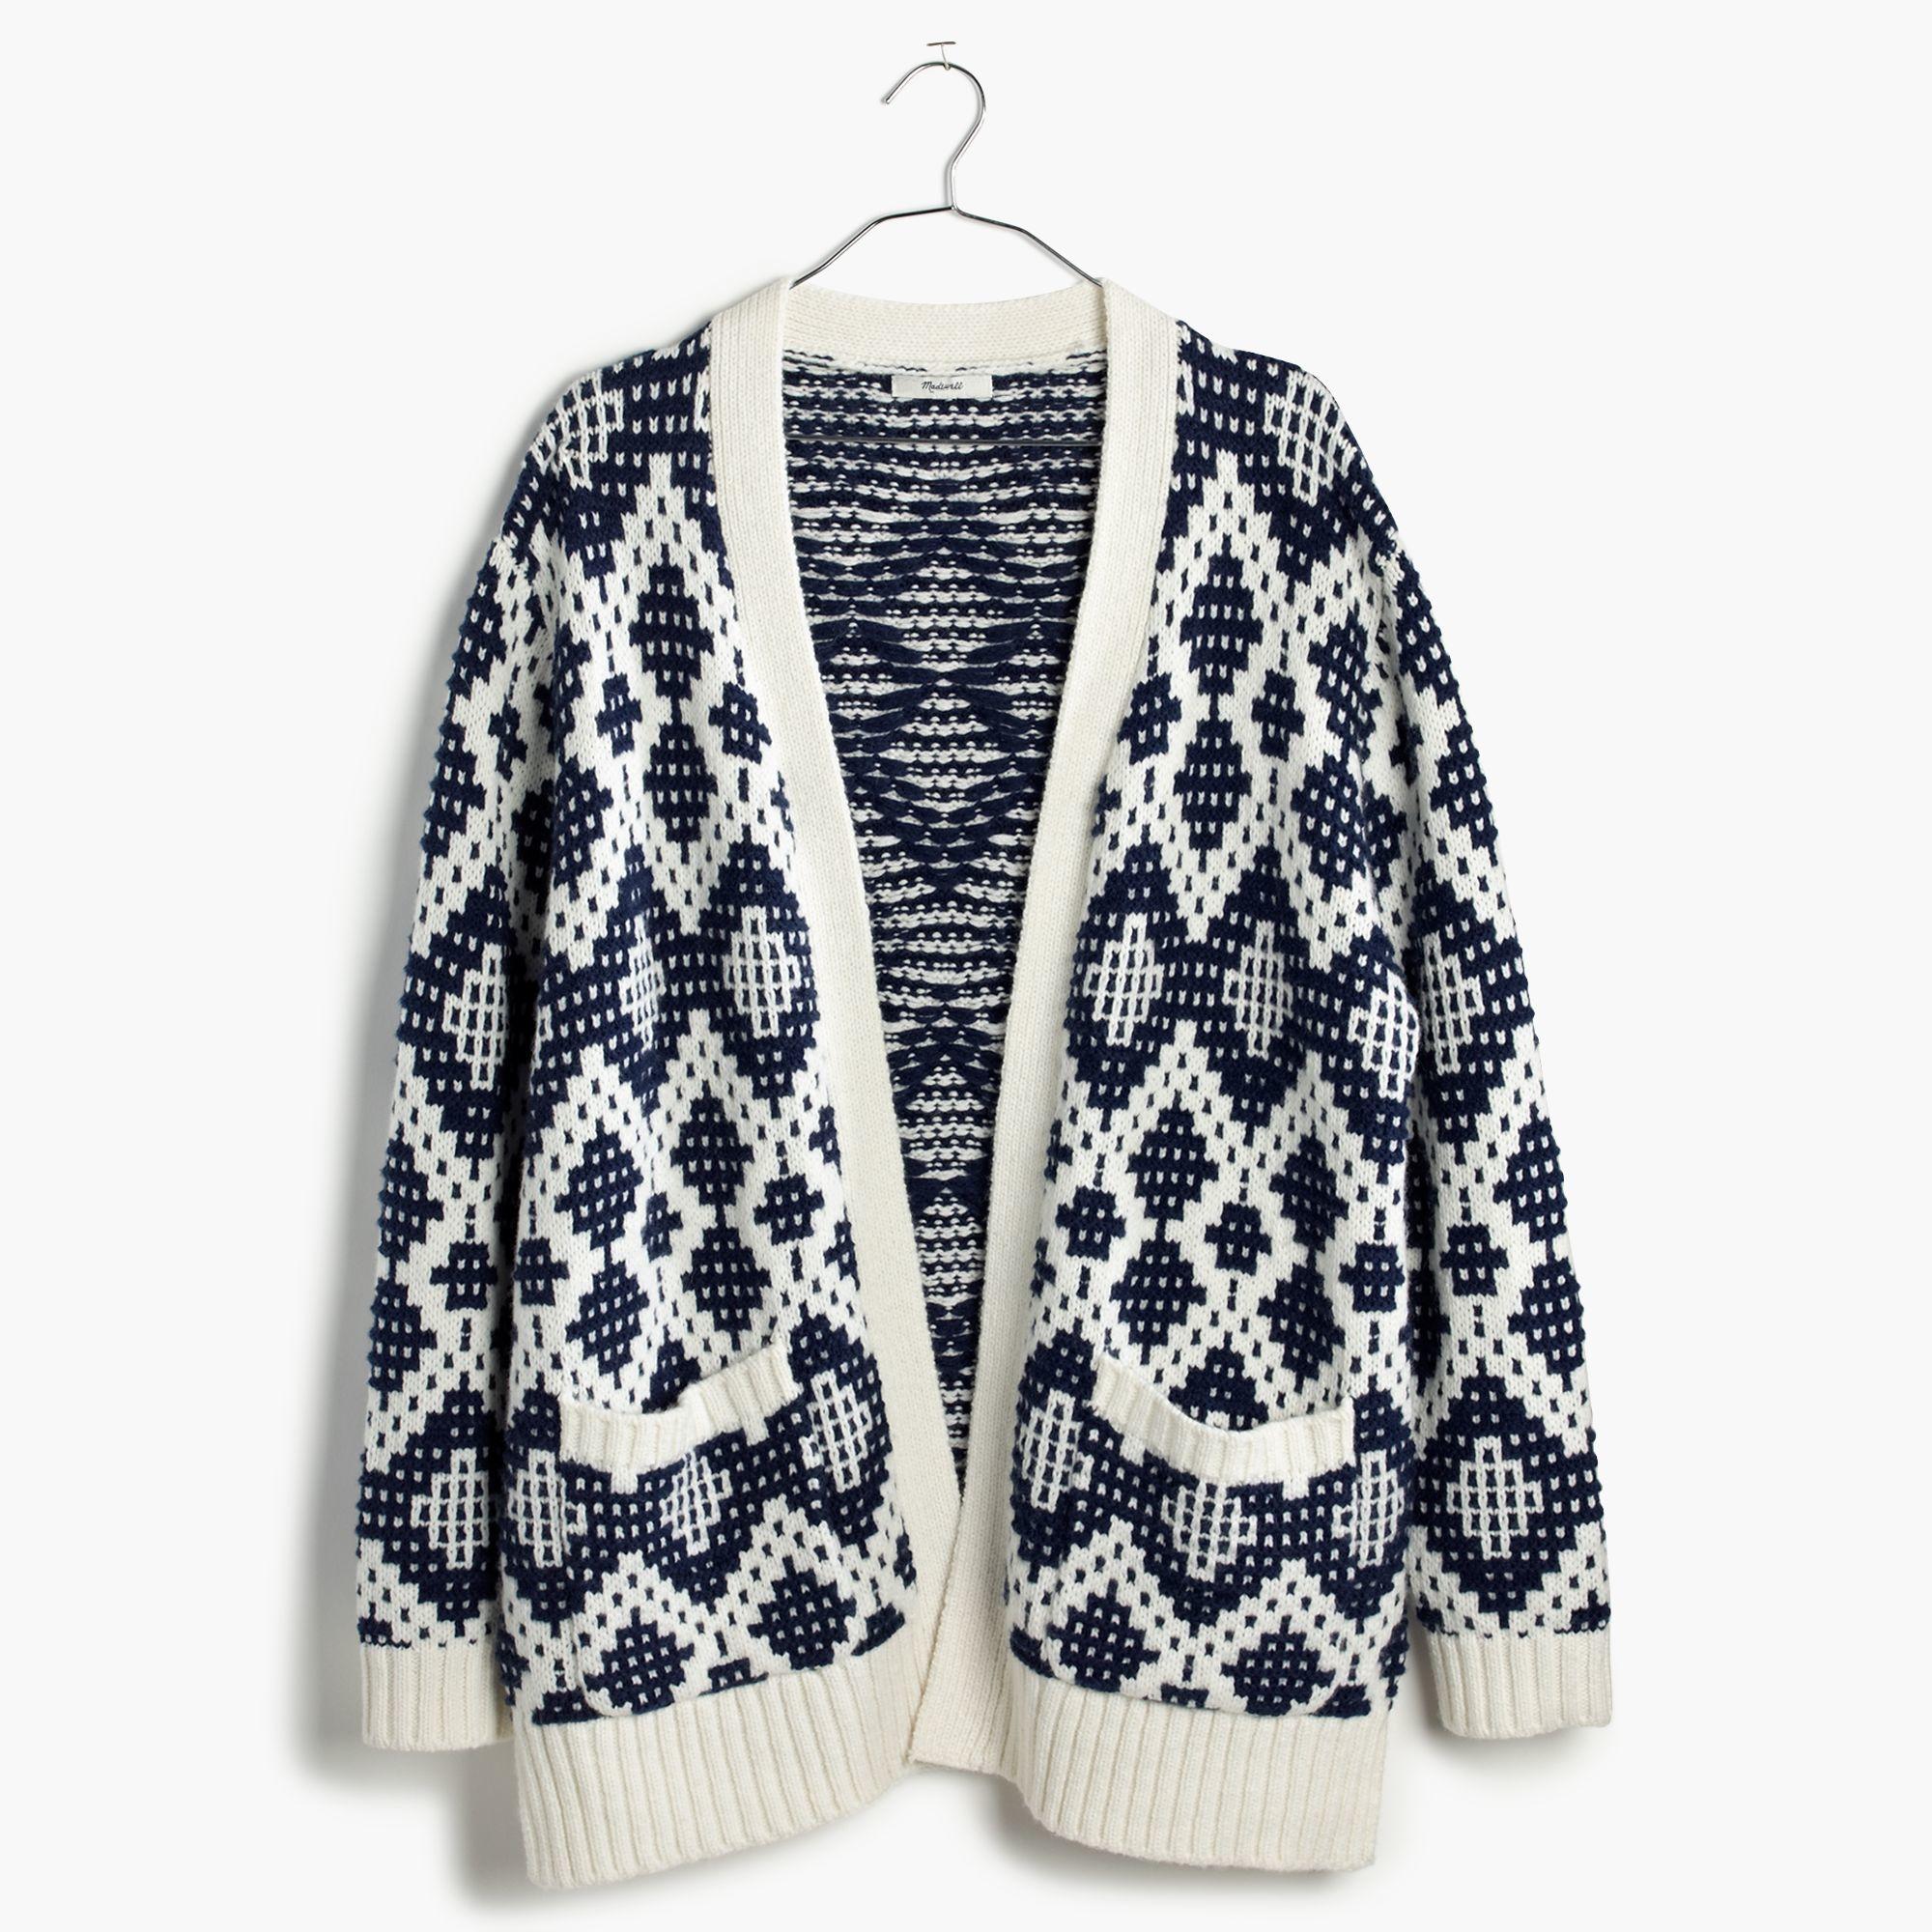 Madewell Contrast Fair Isle Cardigan Sweater in Blue | Lyst